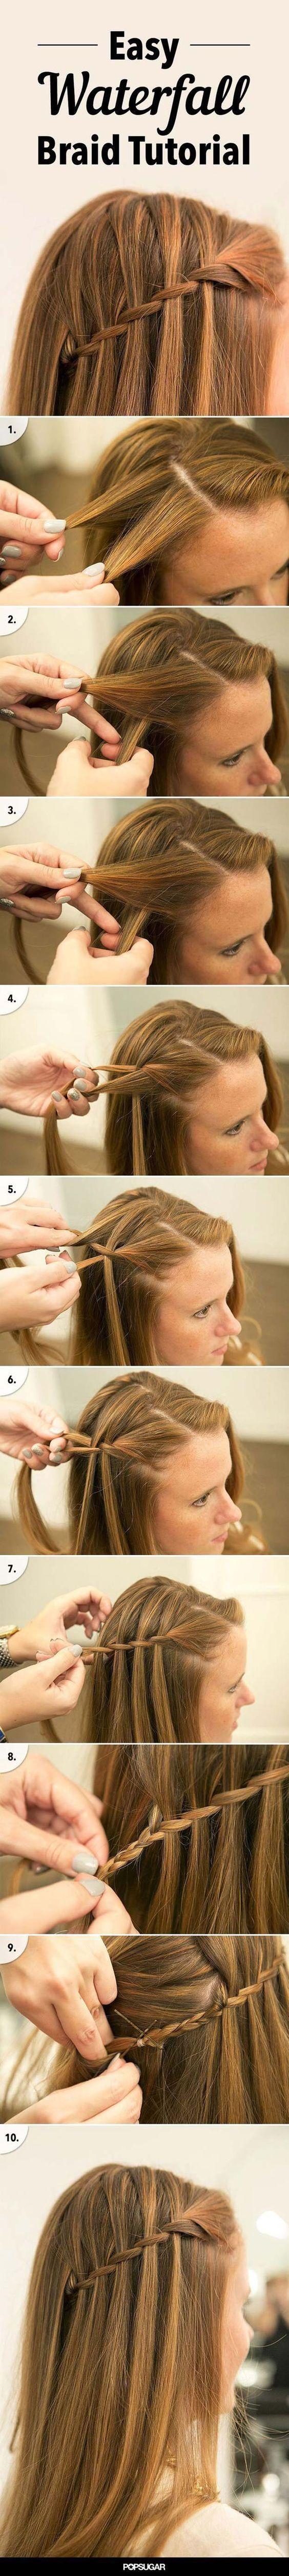 Best hairstyles for long hair waterfall braid tutorial step by